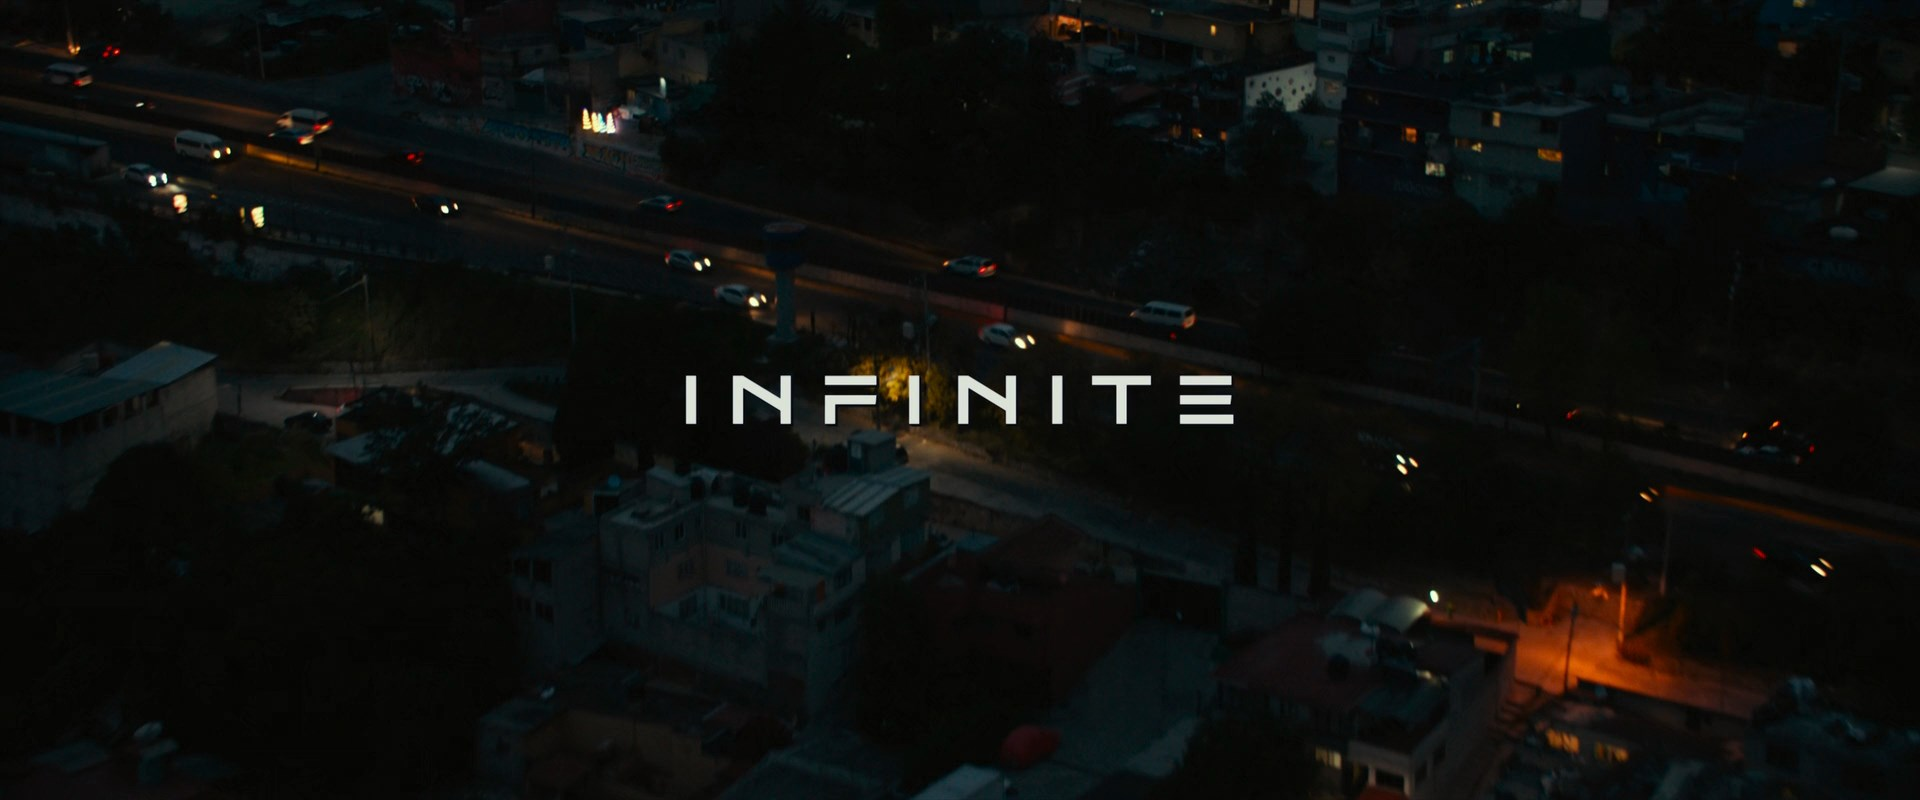 Infinito (2021) 1080p 60FPS WEB-DL AMZN Latino